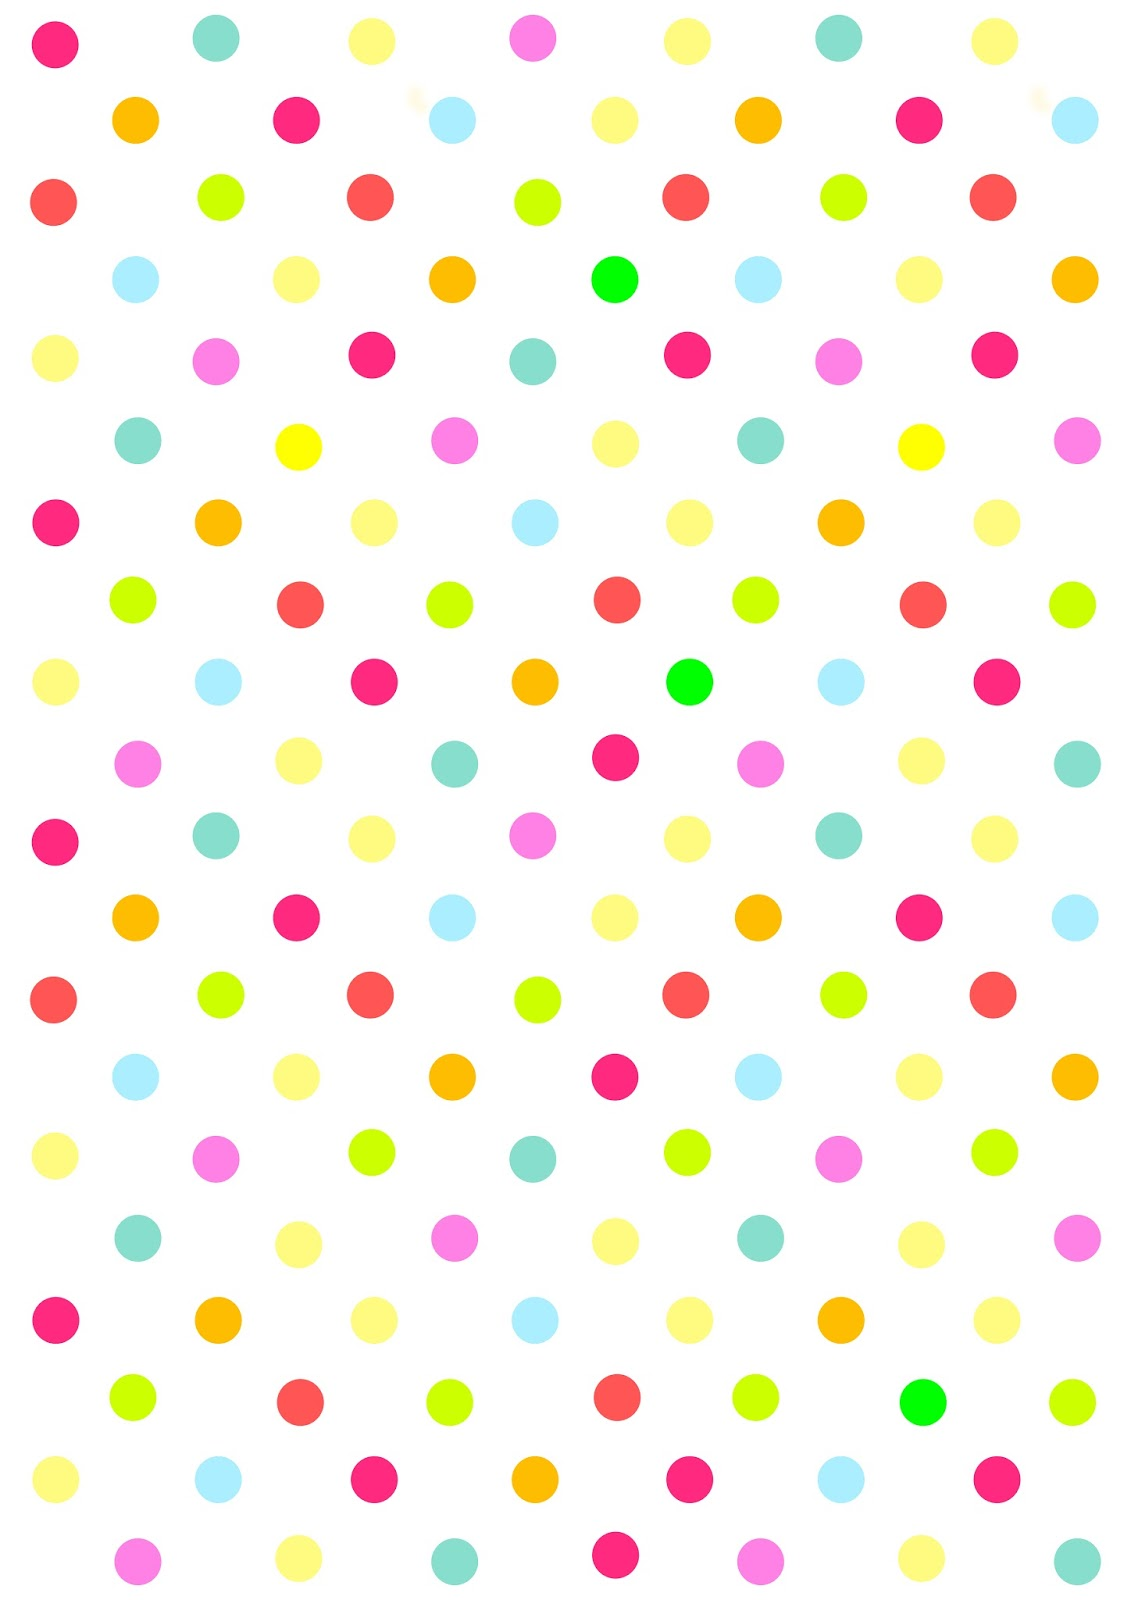 8 Images of Polka Dot Paper Printable